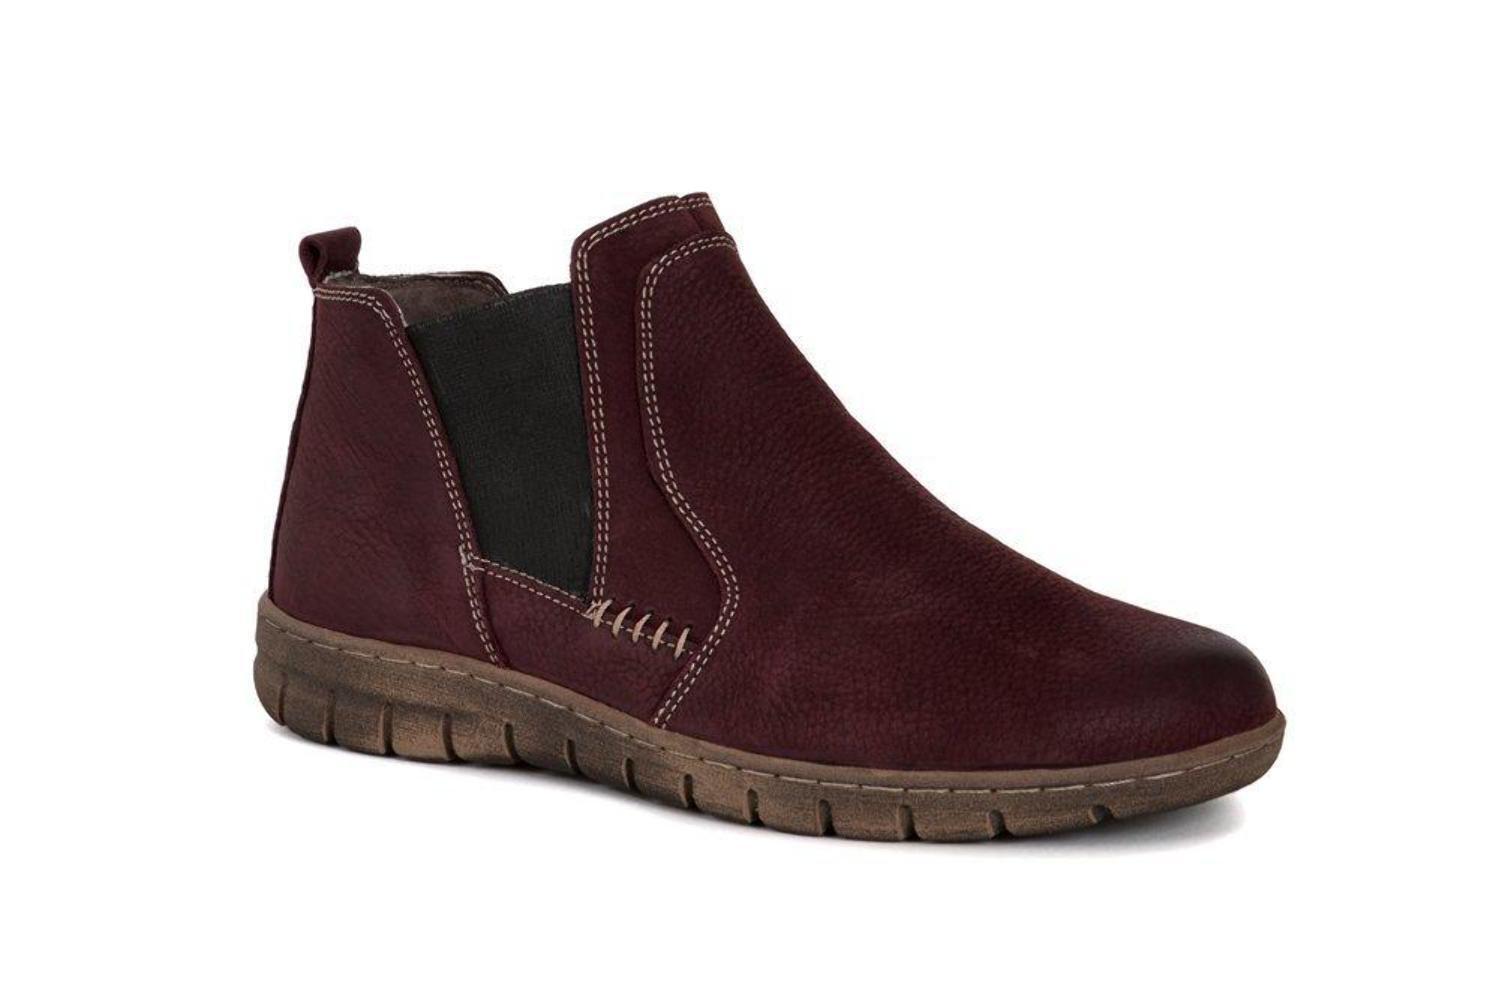 Josef Seibel Steffi 49 Bordo rot Nubuck Leather Stiefel